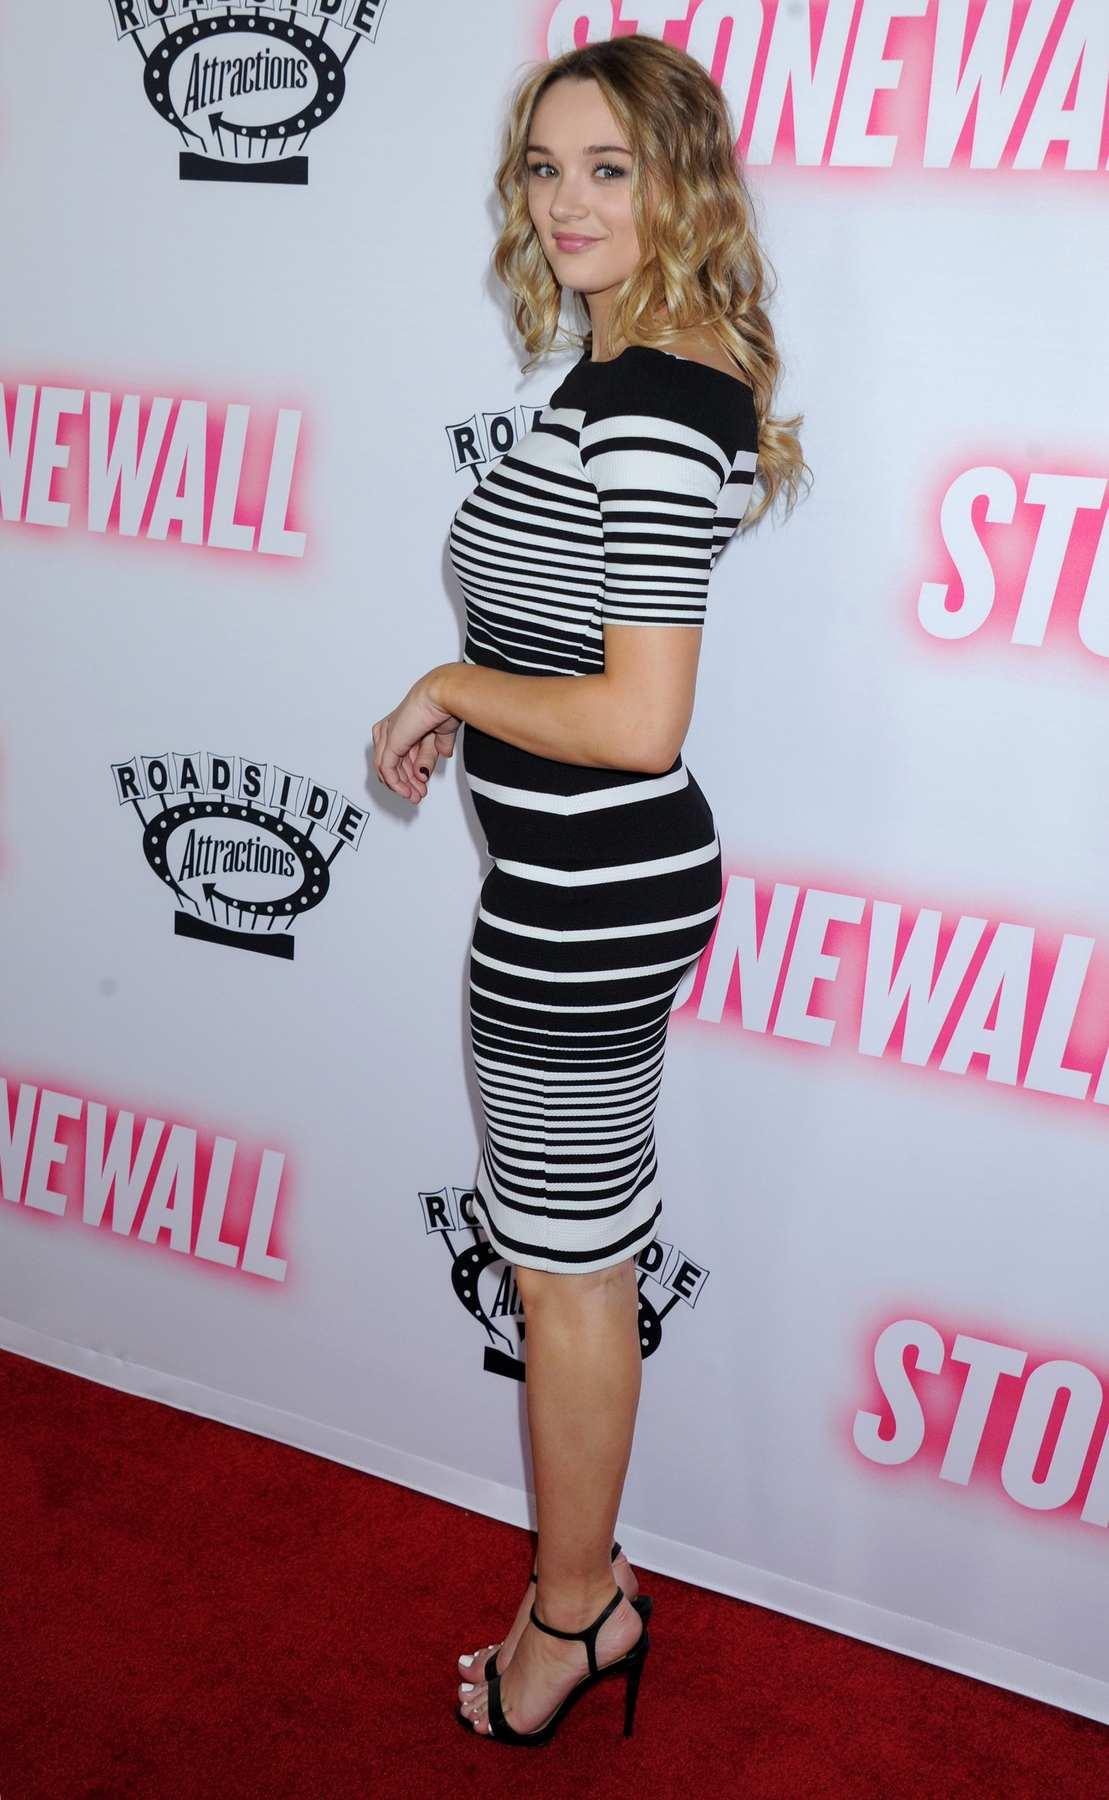 Sisters Love Joey King and Hunter King at Stonewall LA Premiere-4